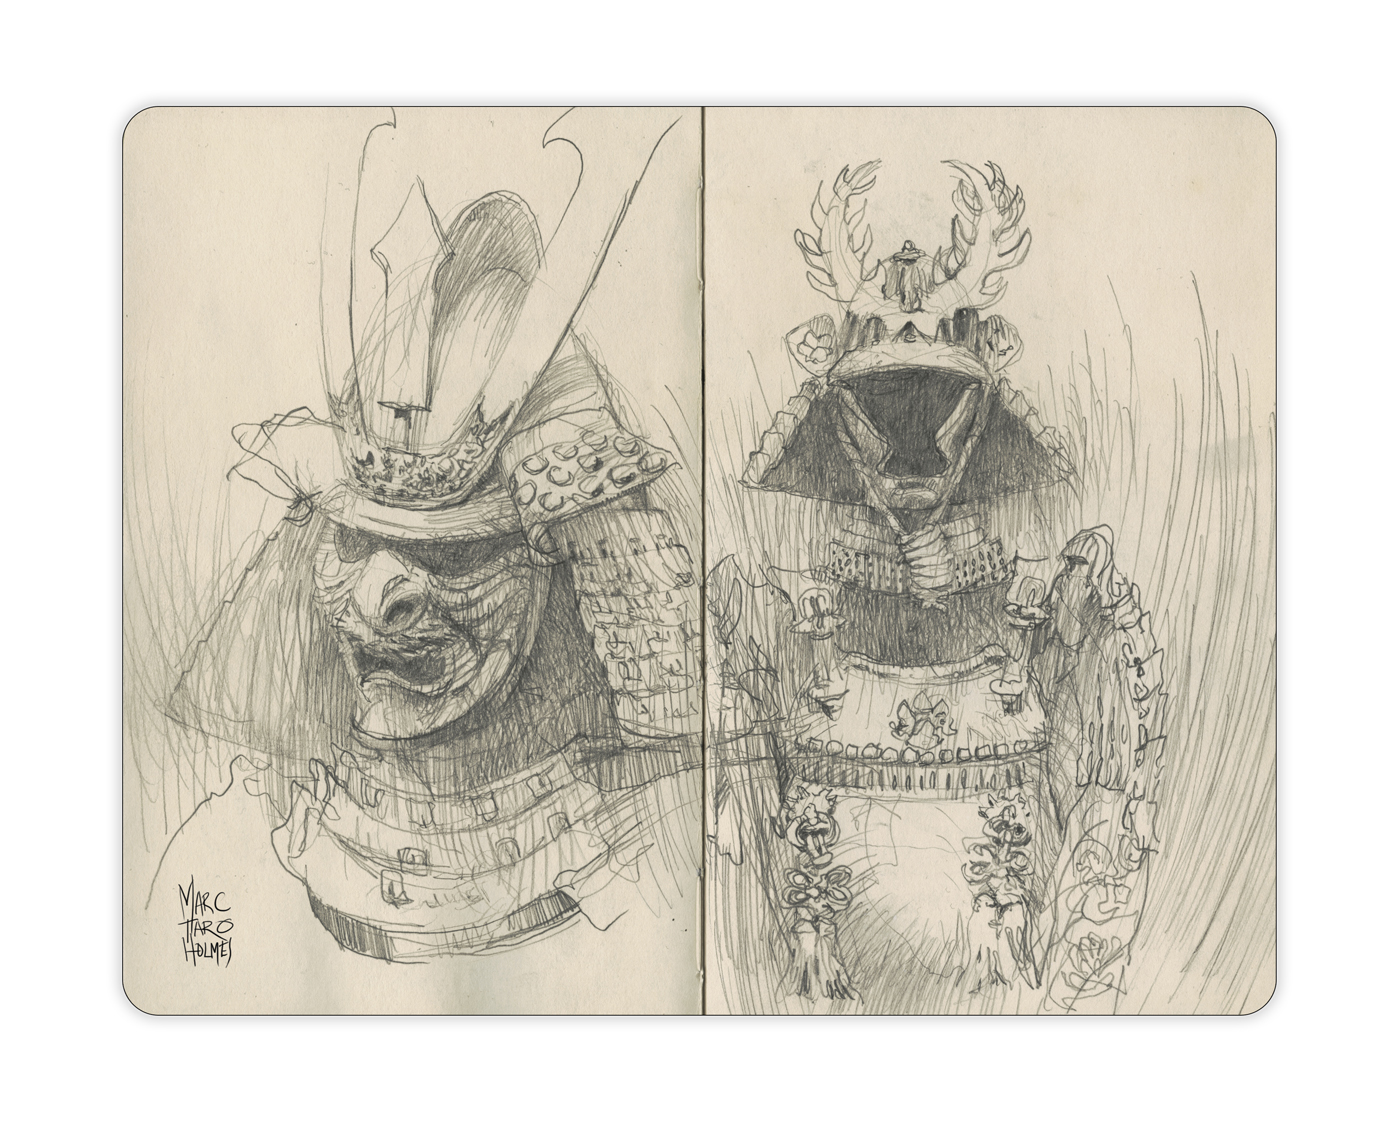 Drawn samurai two sword Callière à Citizen Samurai Sketcher